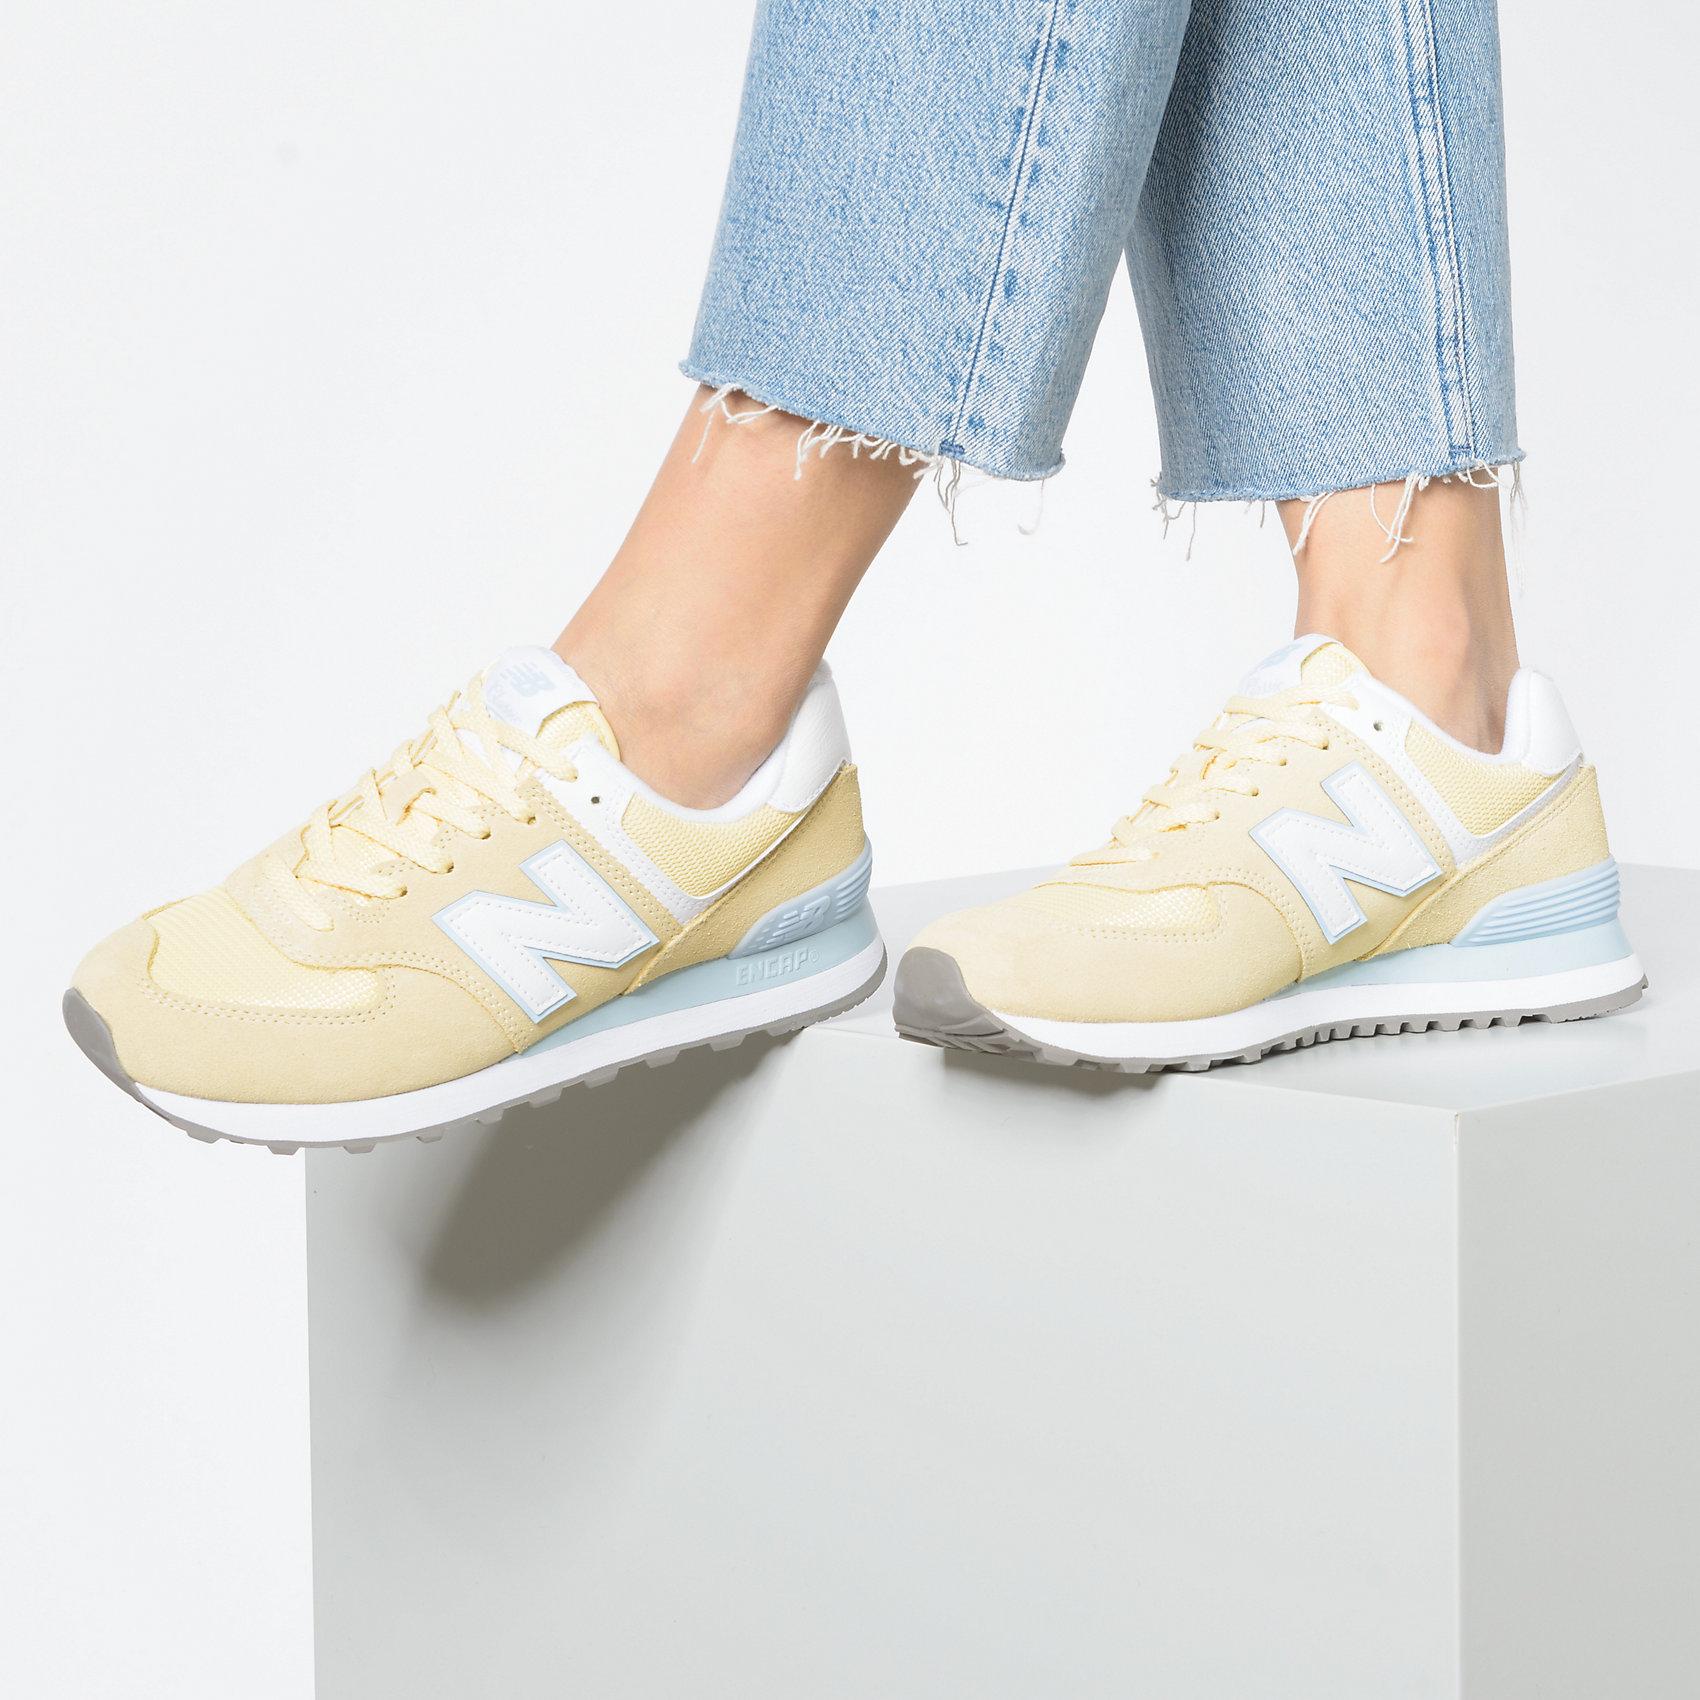 New Zu Beige Grün Für Sneakers Low Balance Neu Damen Wl574 Details Rosa 10527943 TFKJlc1